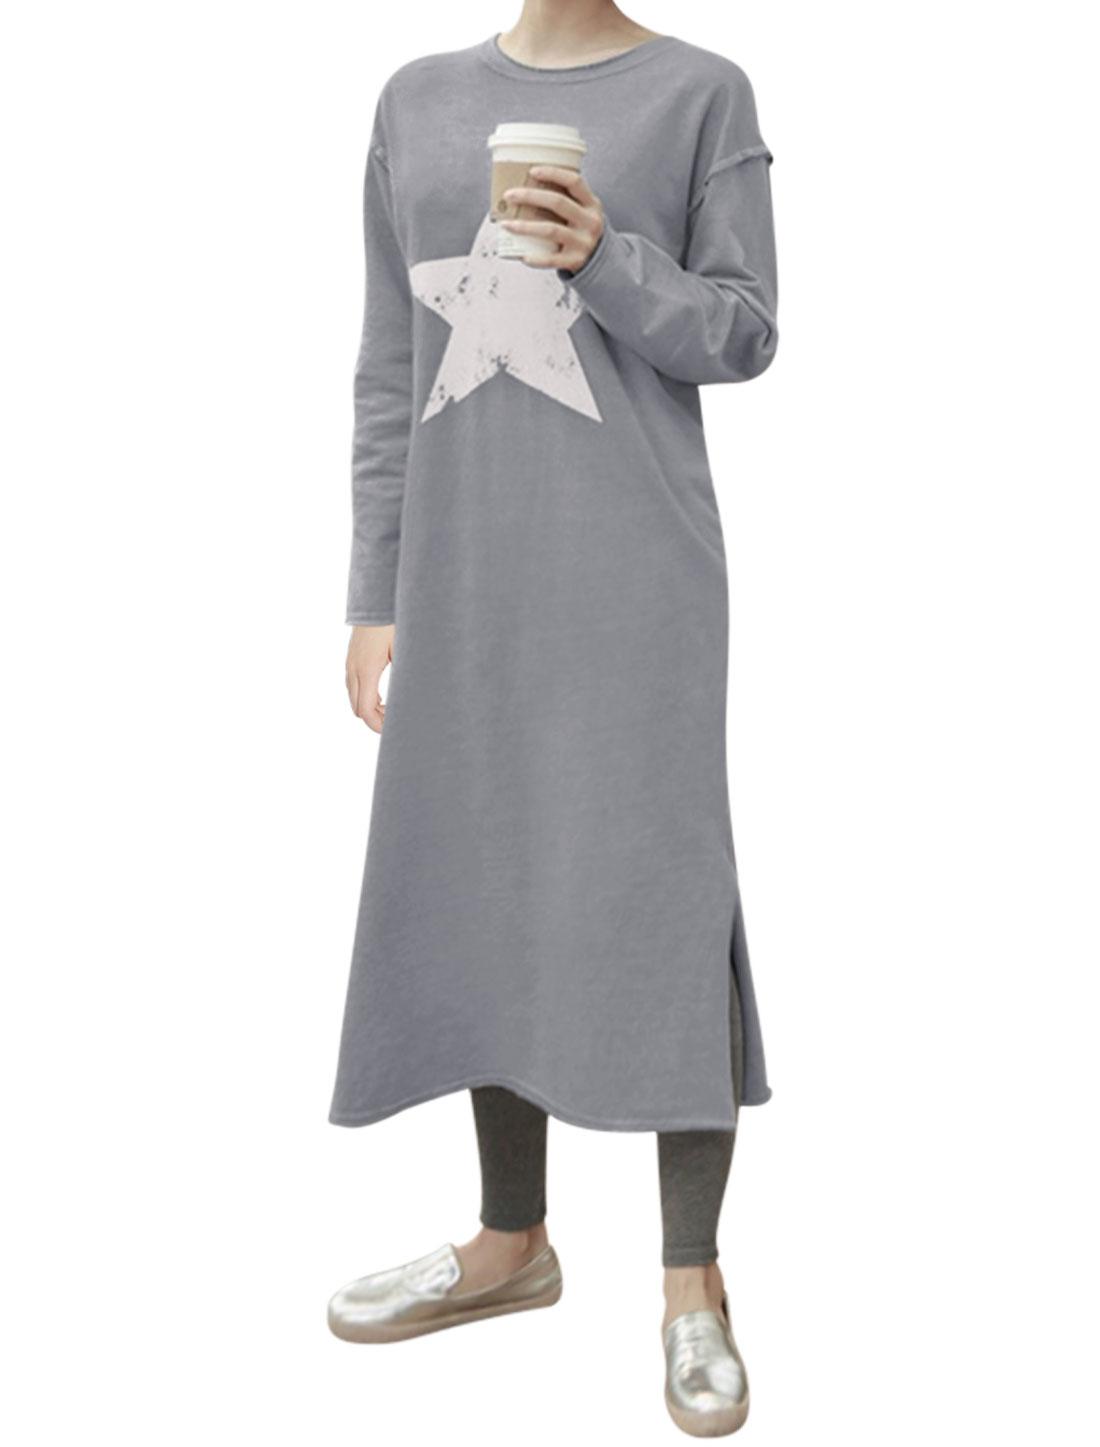 Women Split Sides Star Prints Mid-Calf Sweatshirt Dress Gray XS